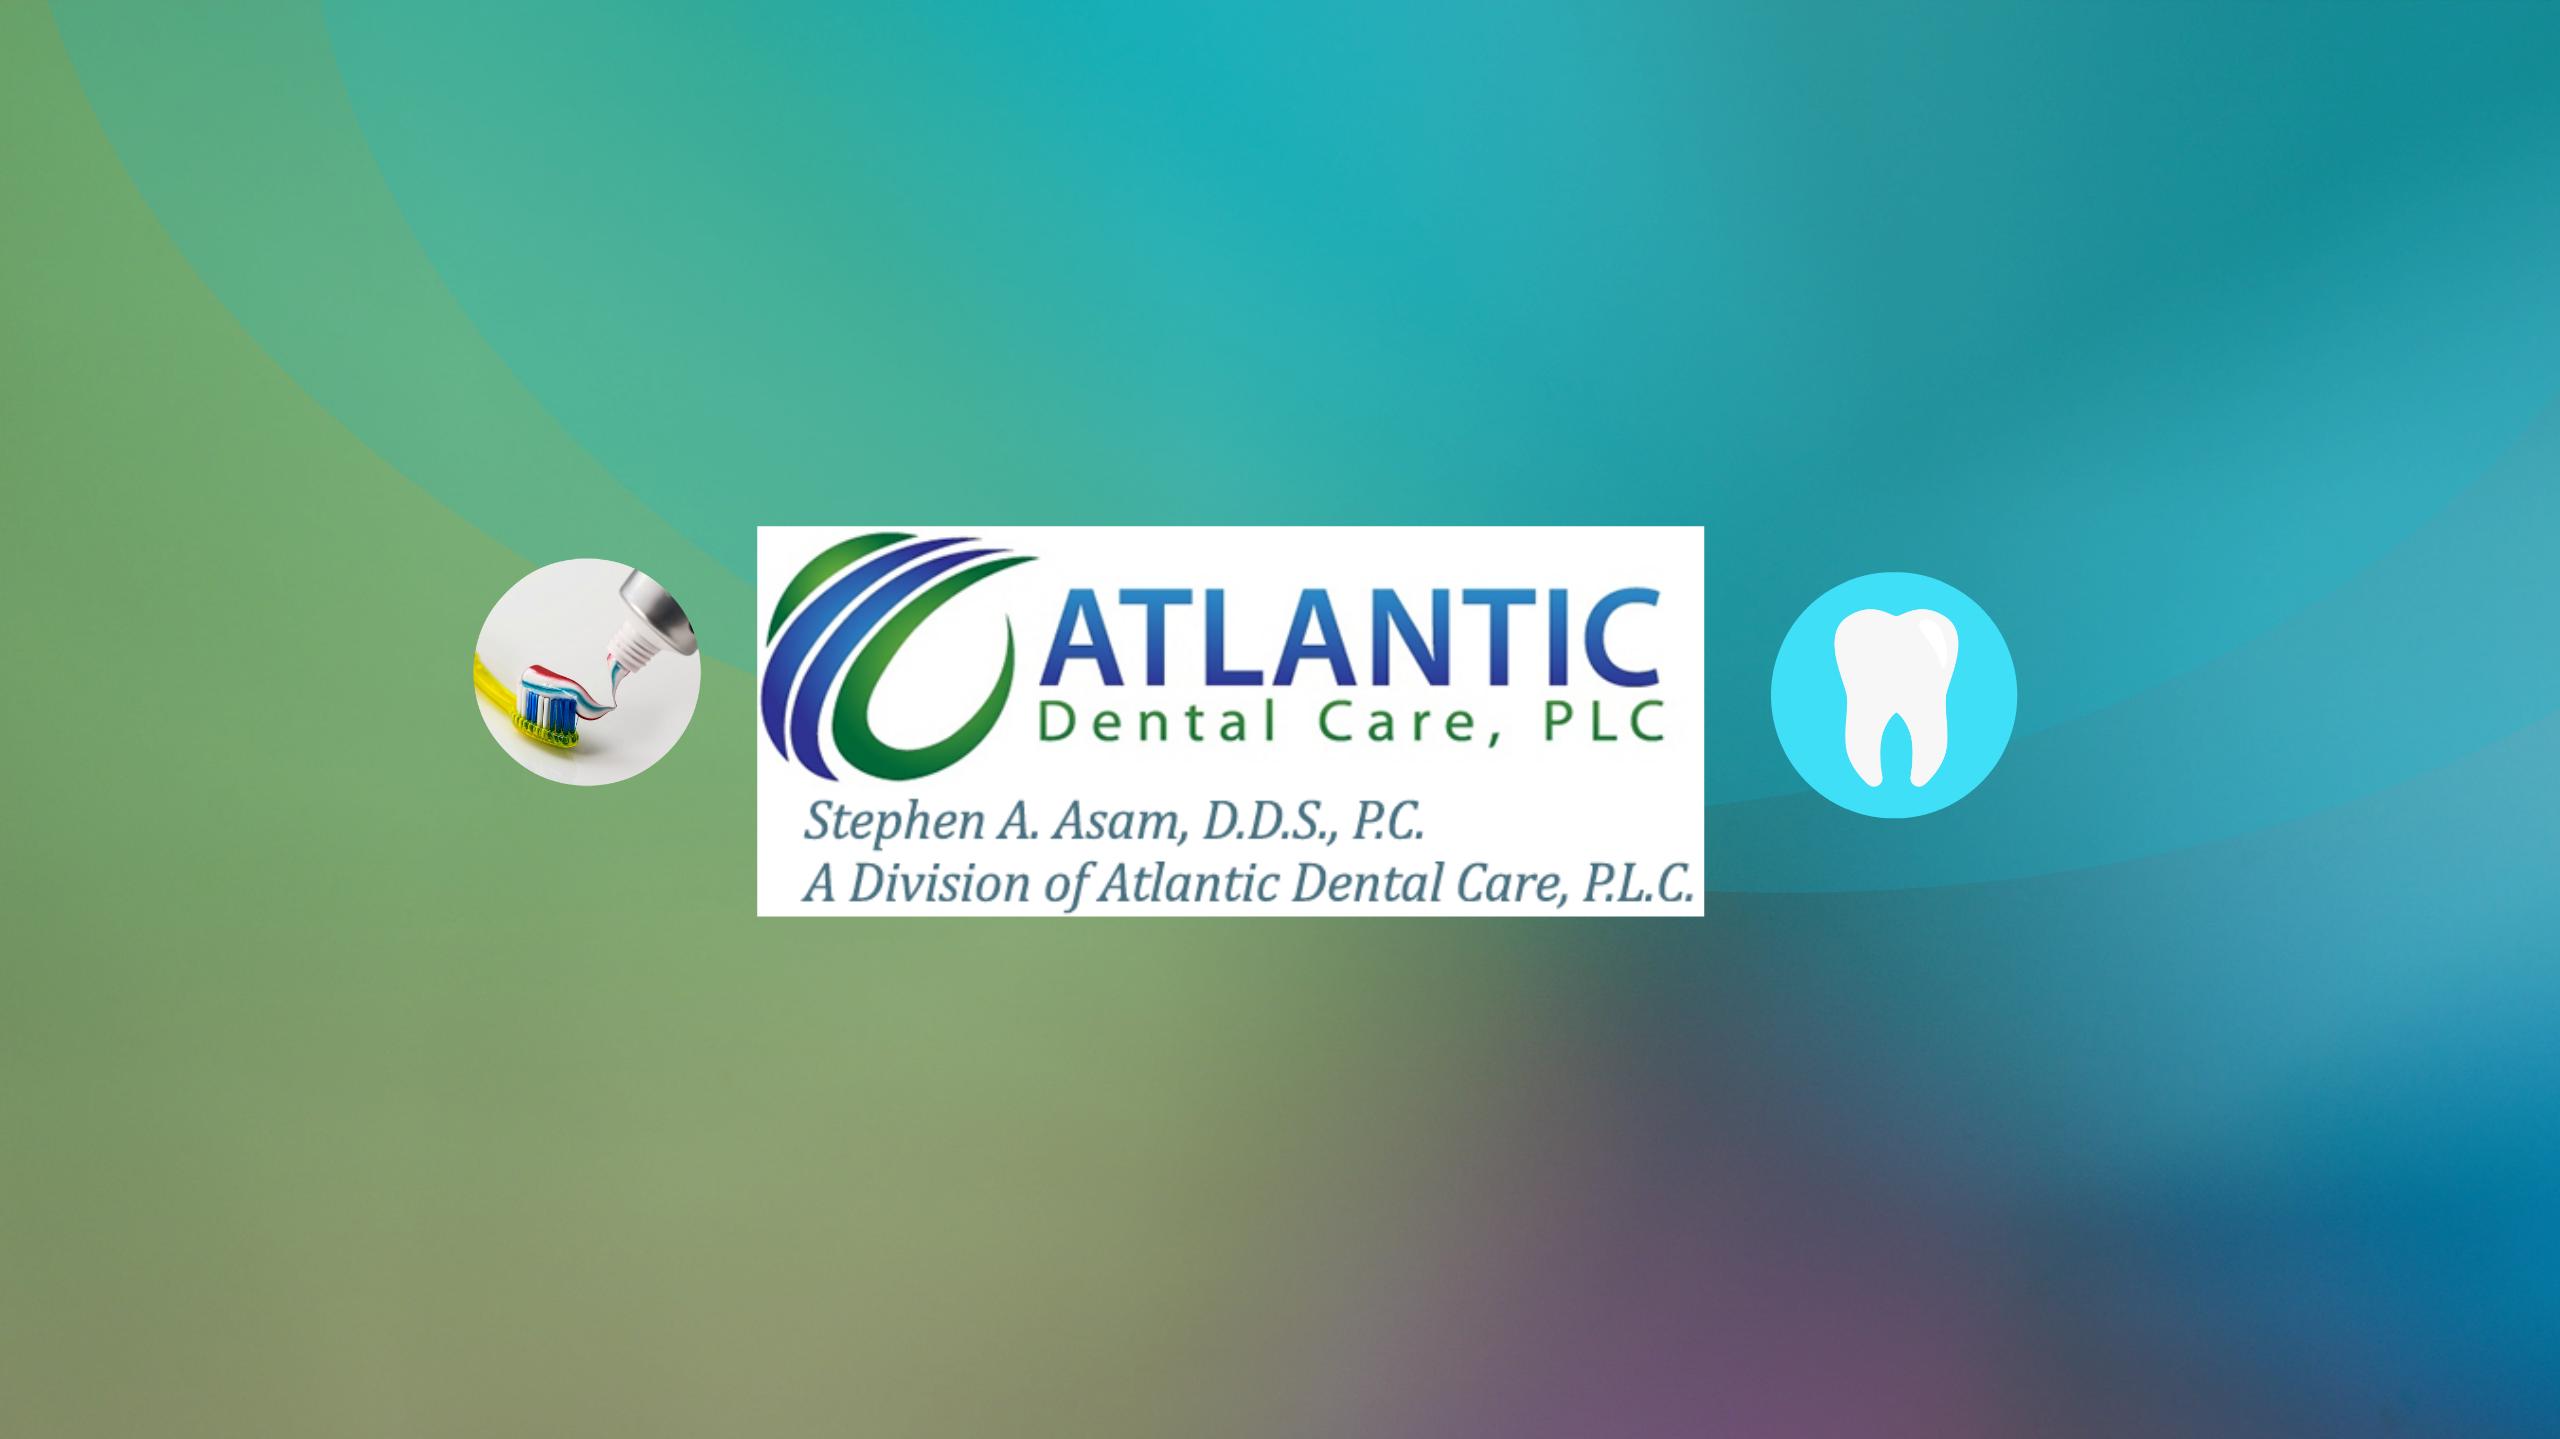 Dr. Stephen Asam/ Chesapeake Dentist 23322/ Atlantic Dental Care